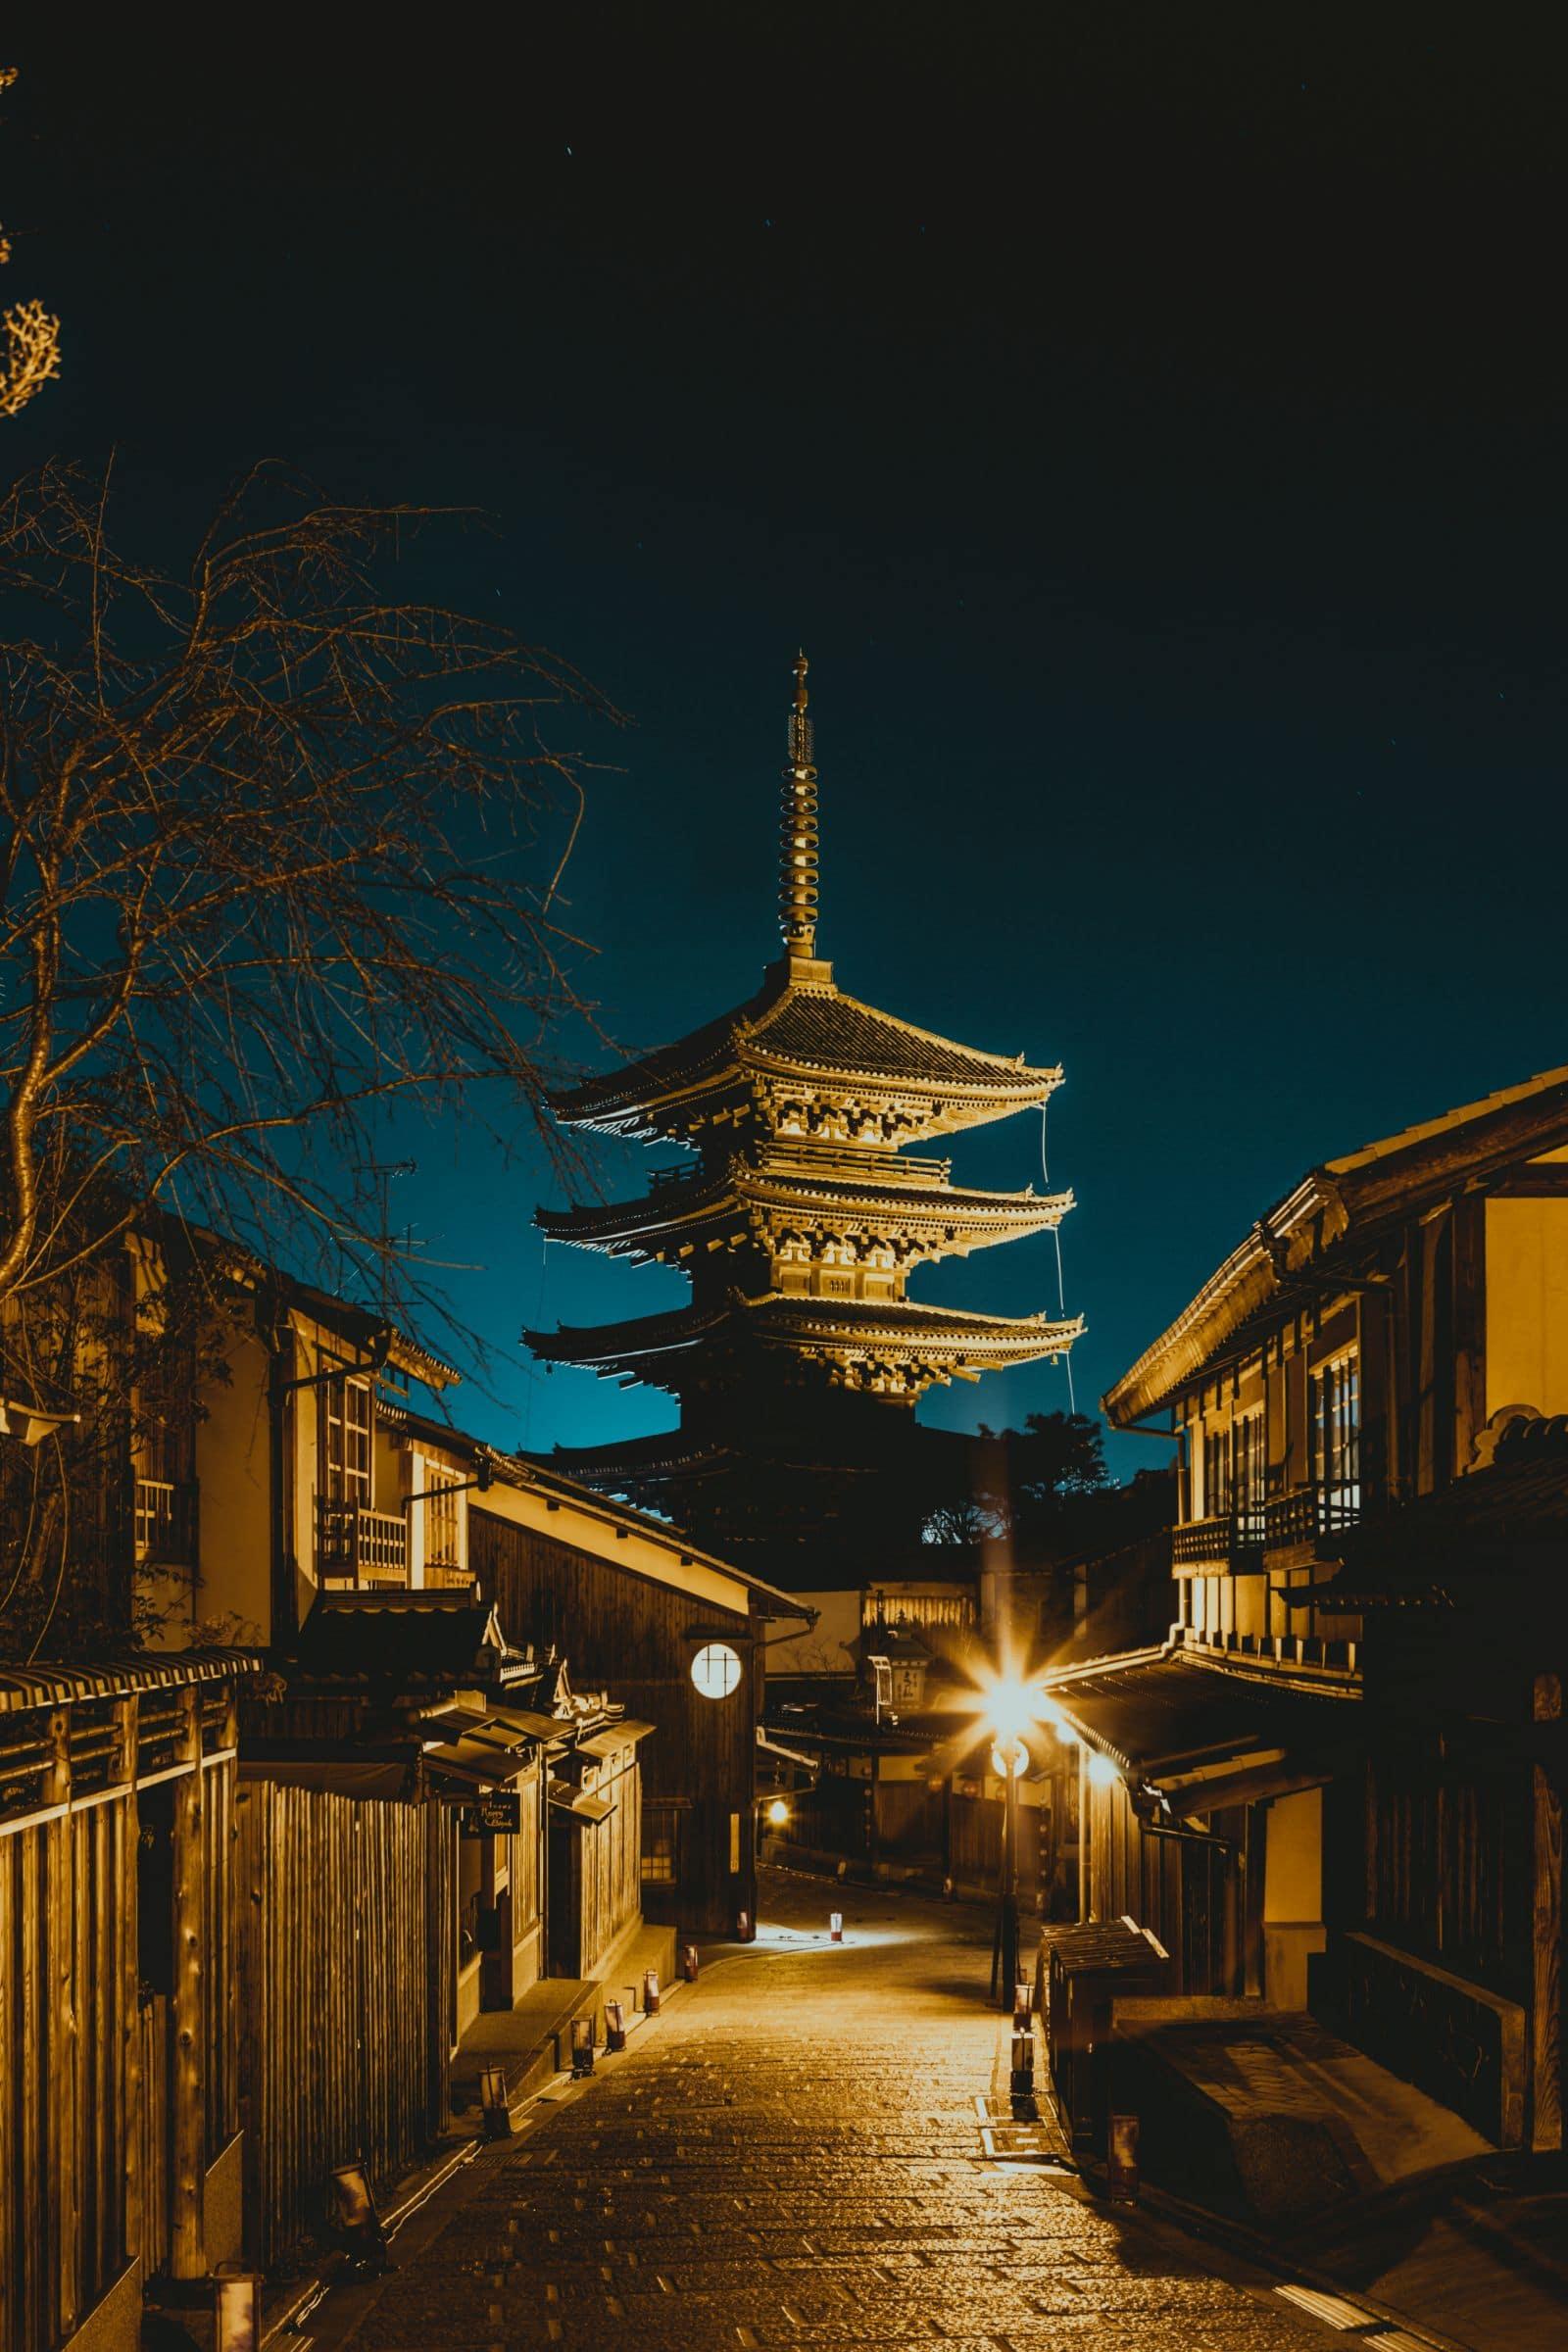 Hokan-ji